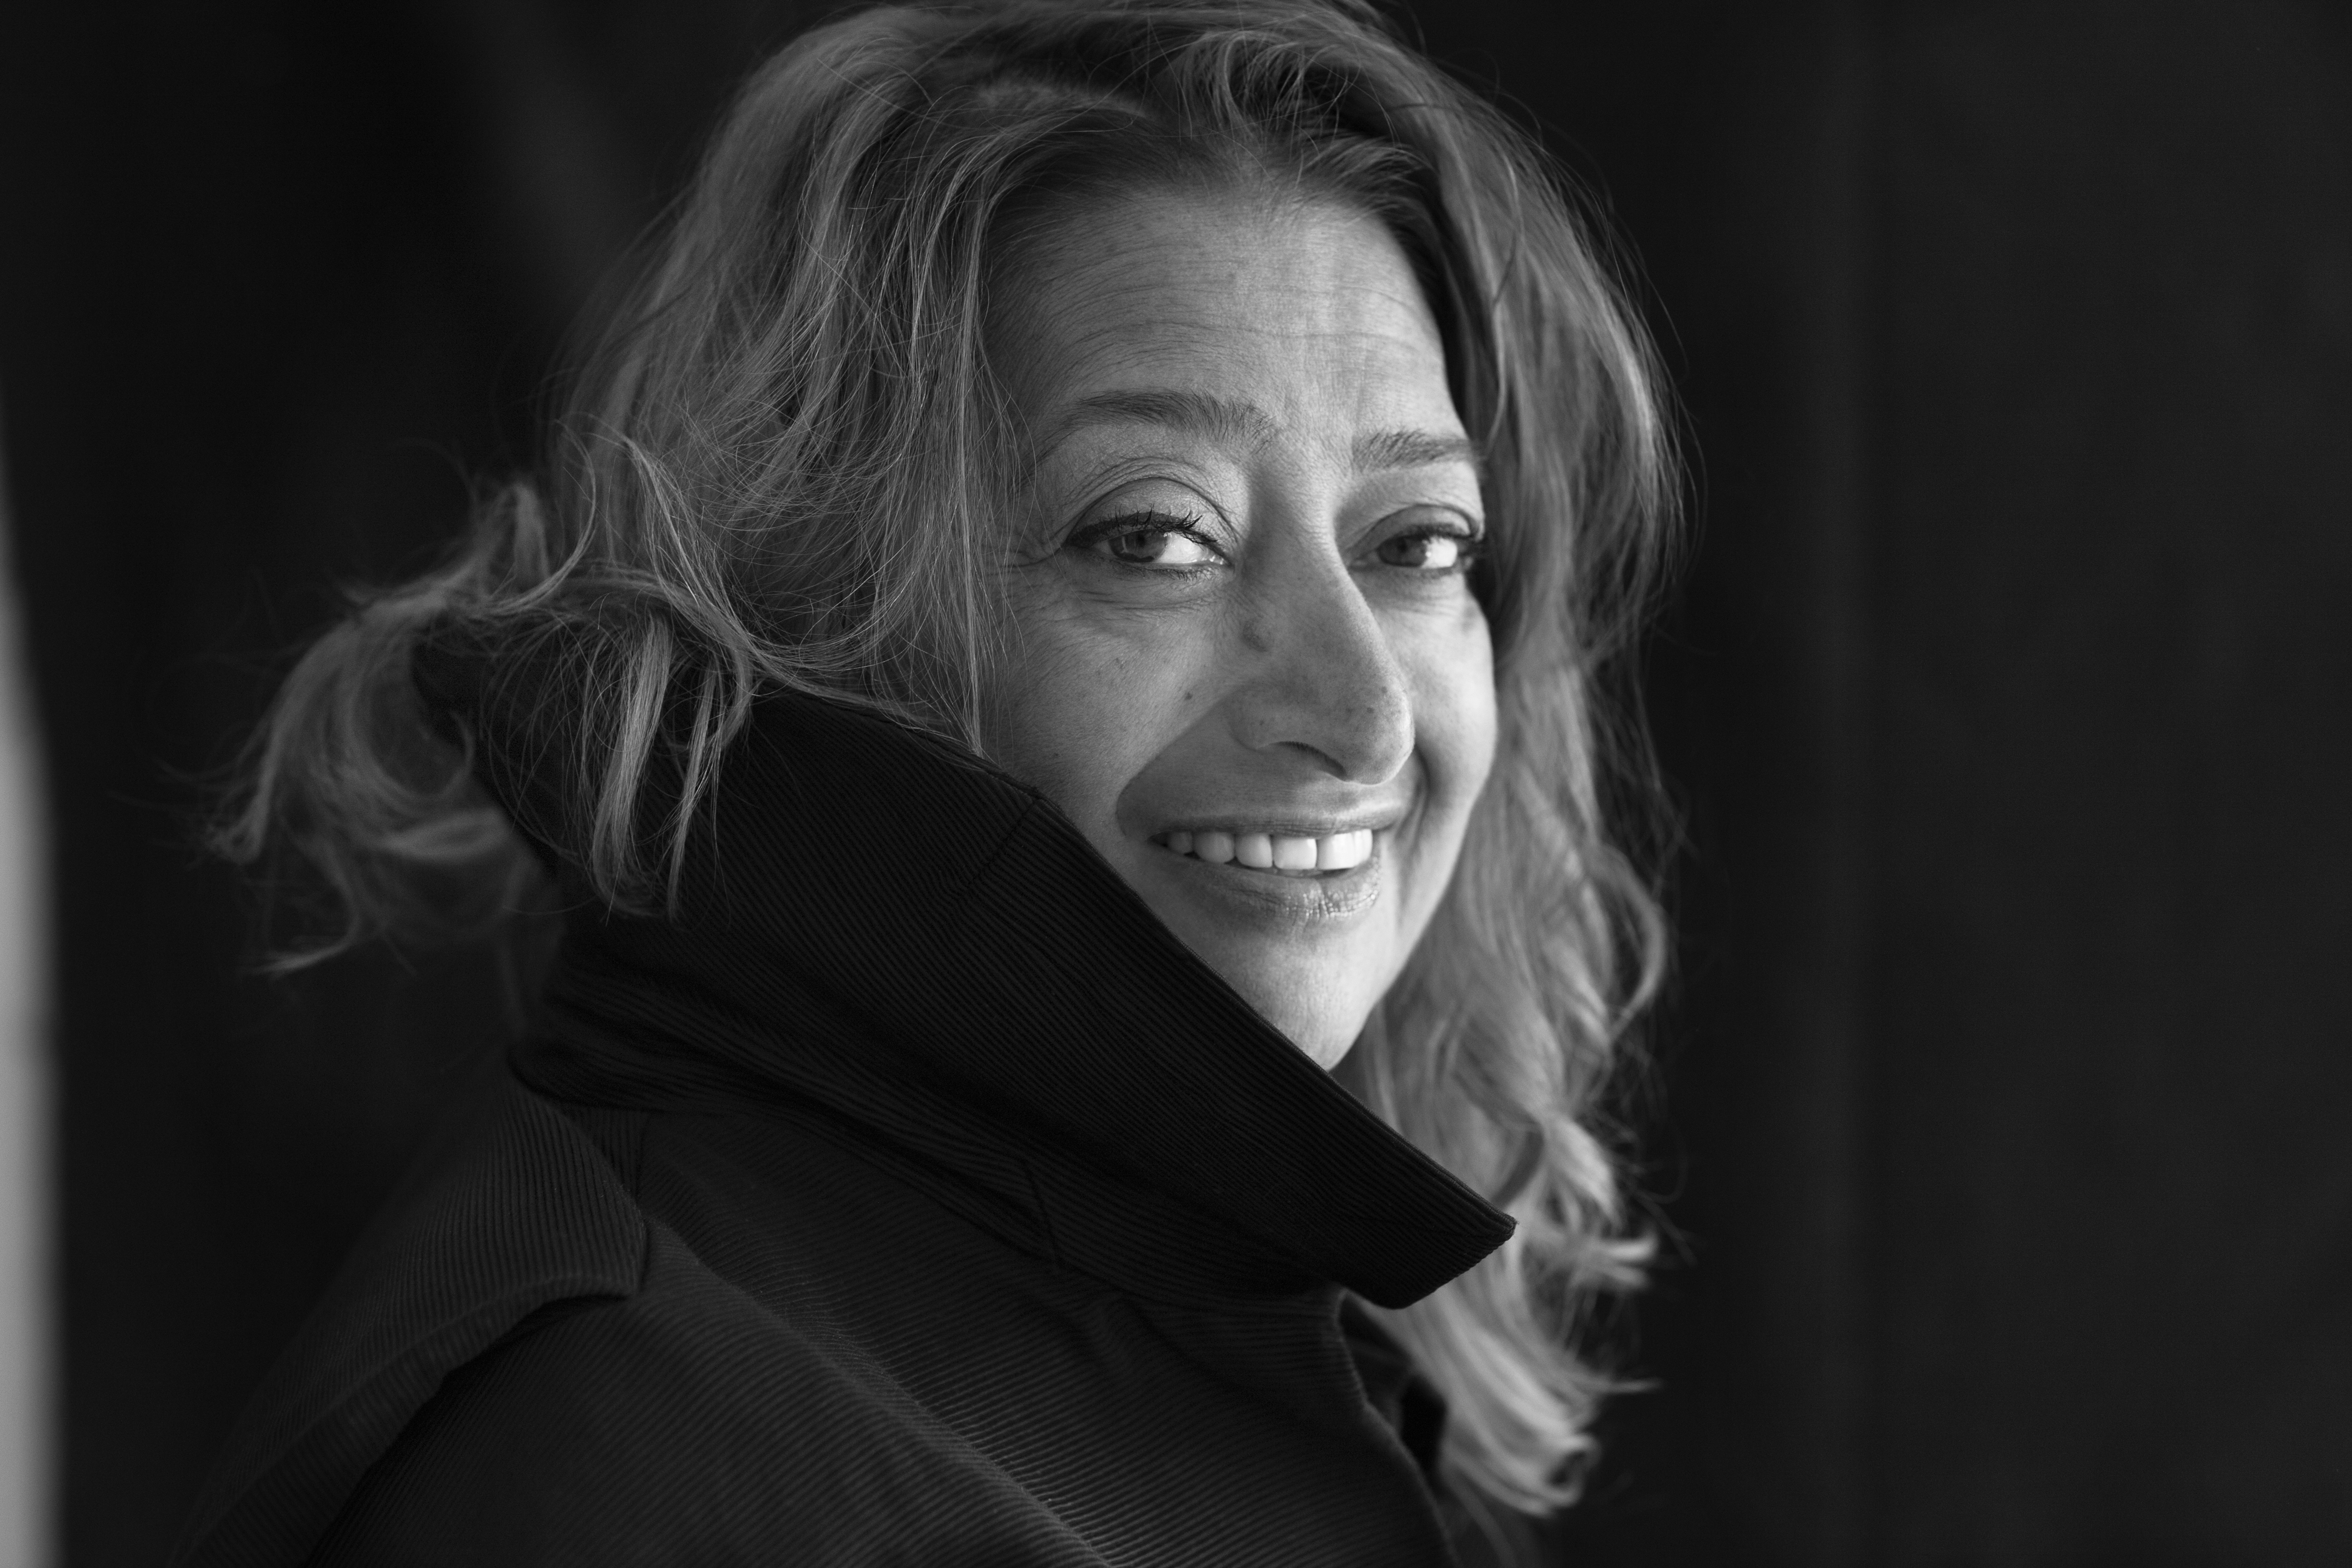 Morre Zaha Hadid, a mulher mais famosa da arquitetura - com ...